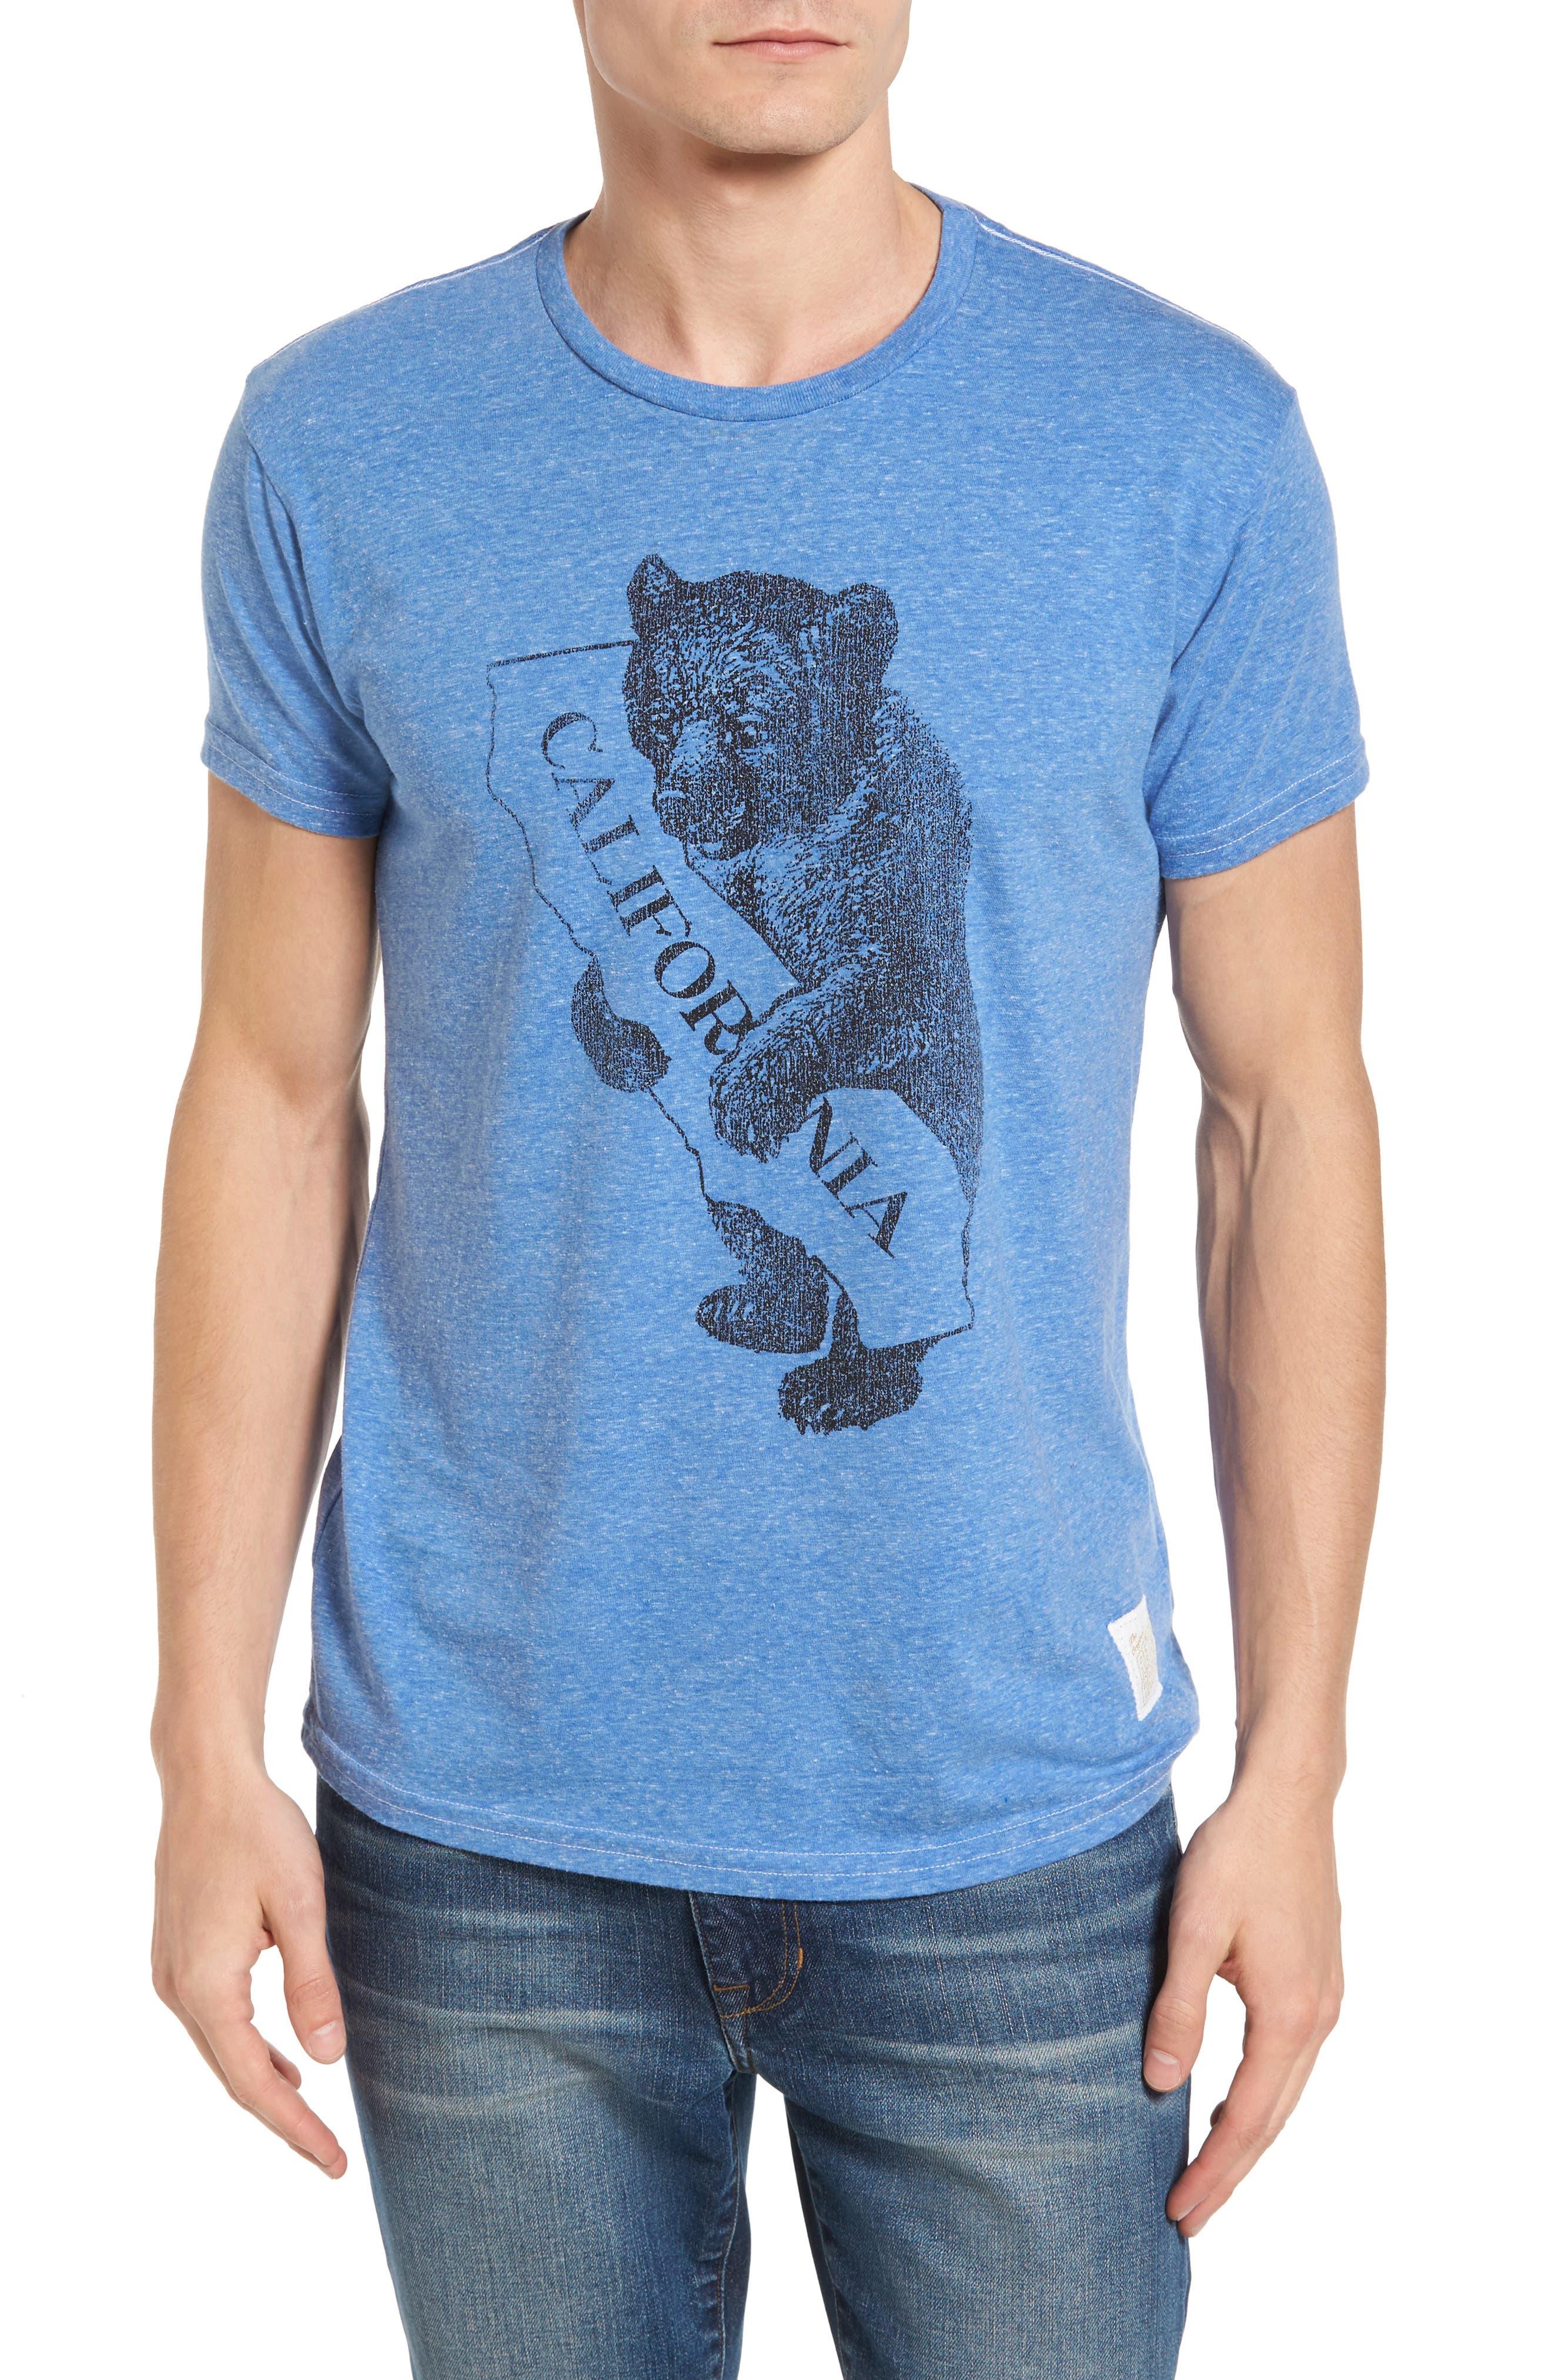 Retro Brand California Republic T-Shirt